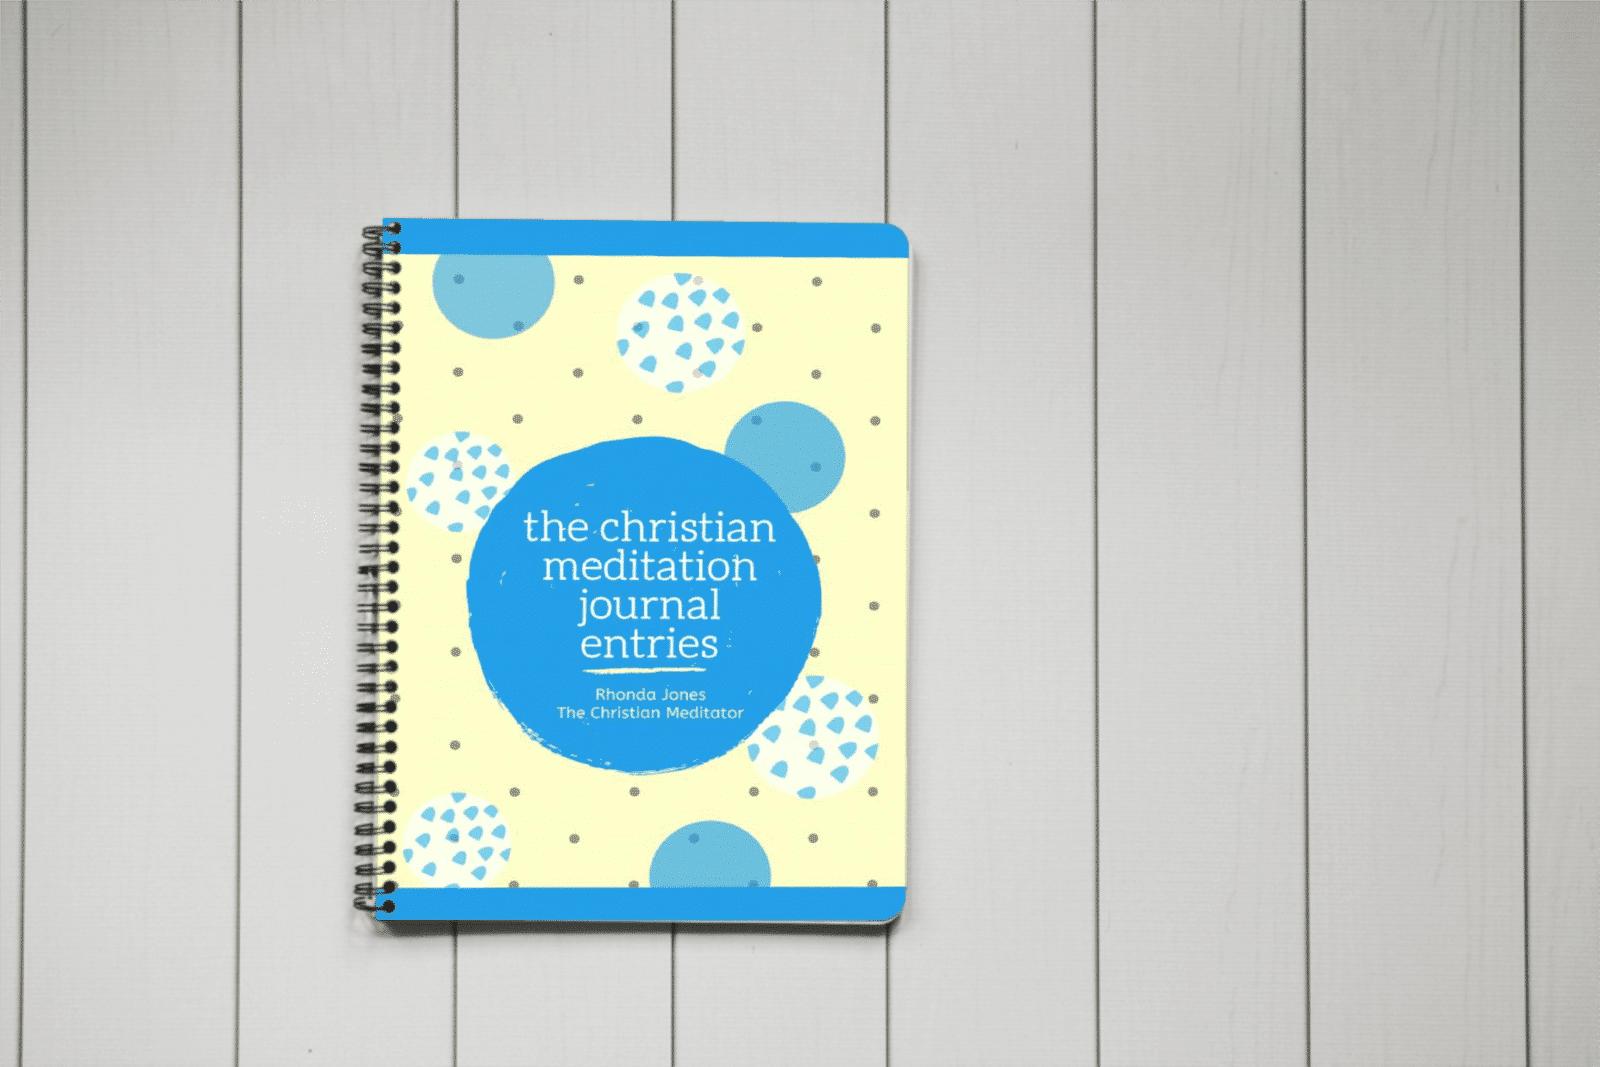 christian meditation journal entries